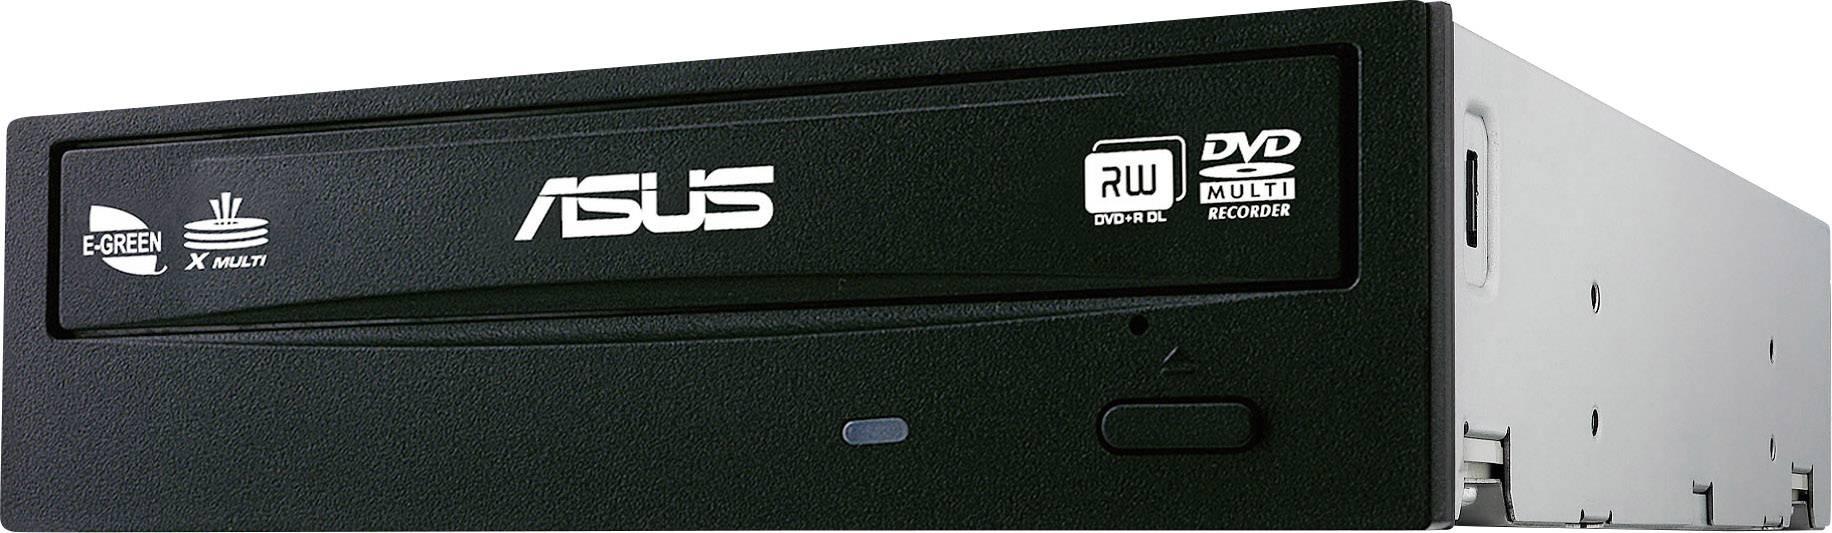 Interní DVD vypalovačka Asus DRW-24D5MT Bulk SATA černá